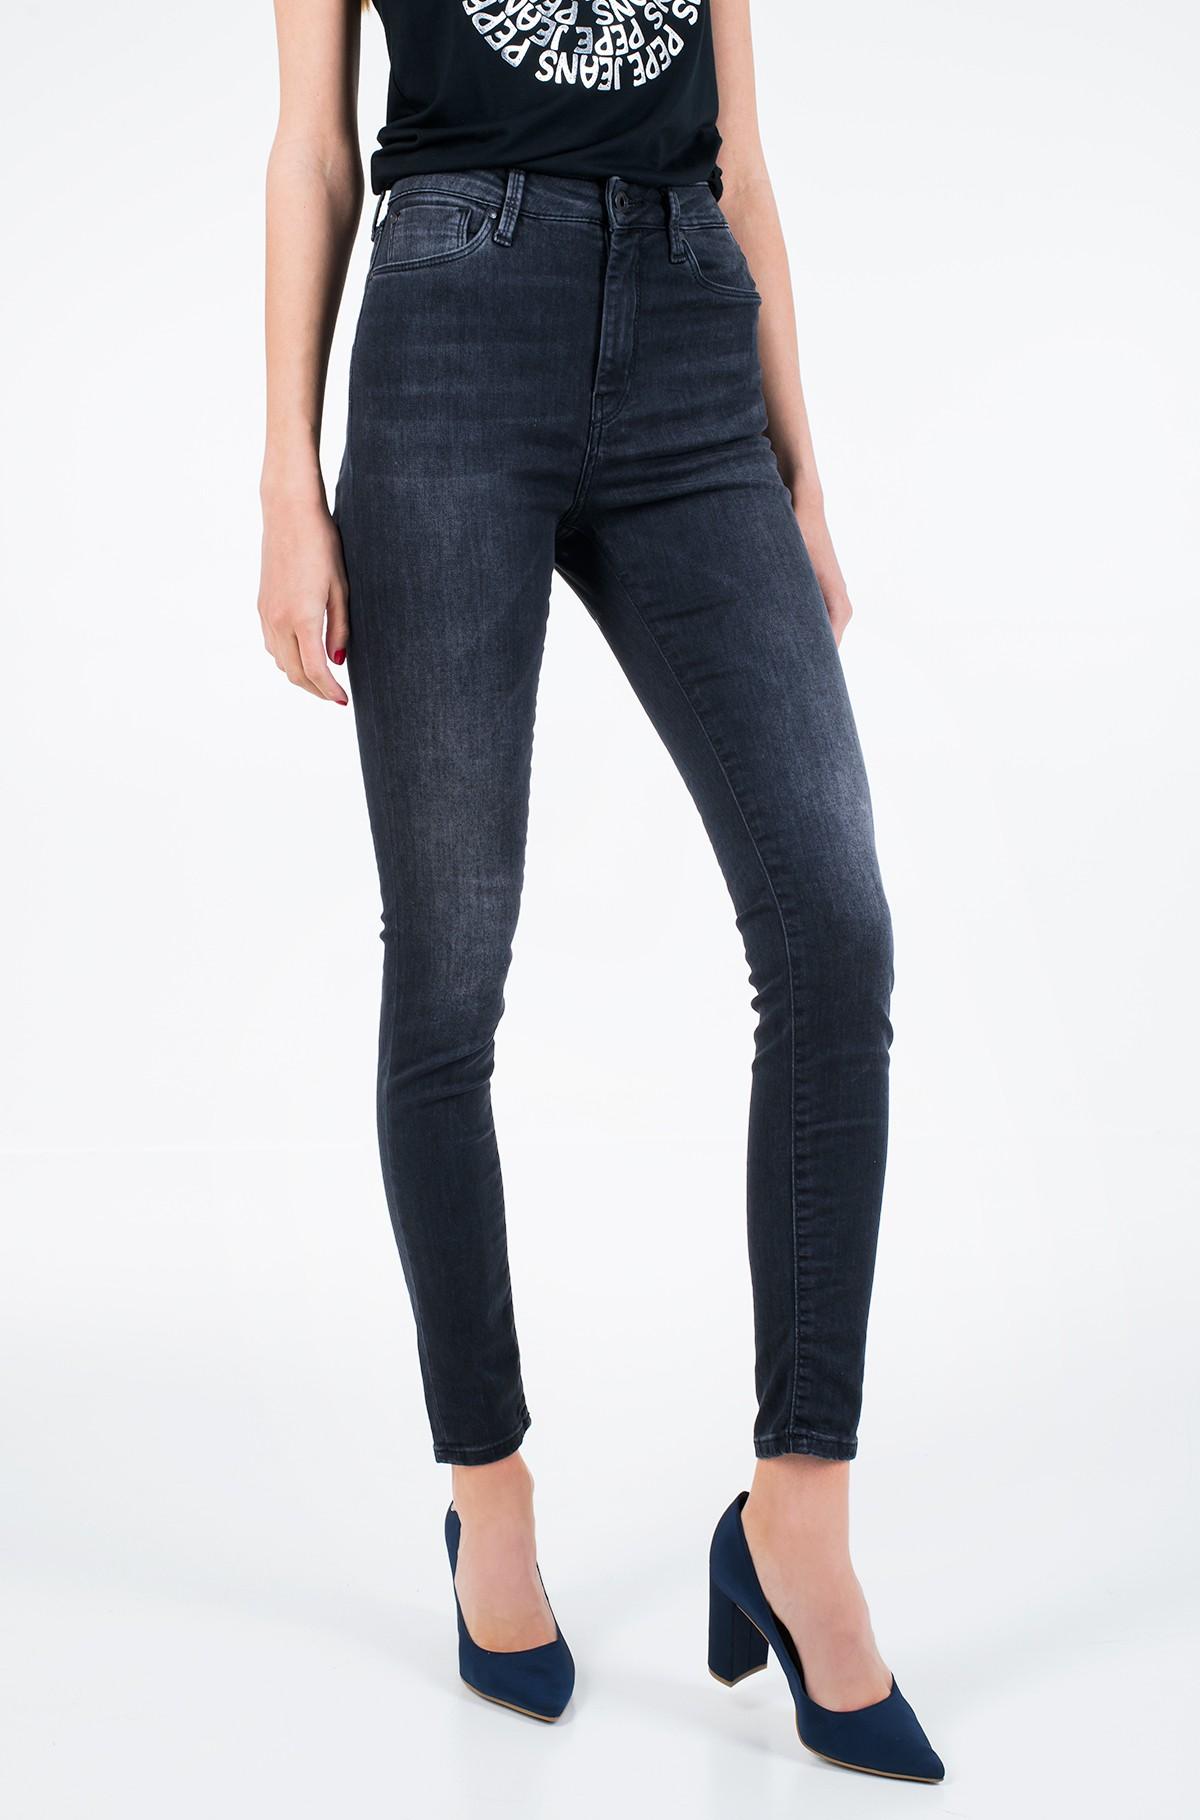 Jeans DION/PL202285XA3-full-1